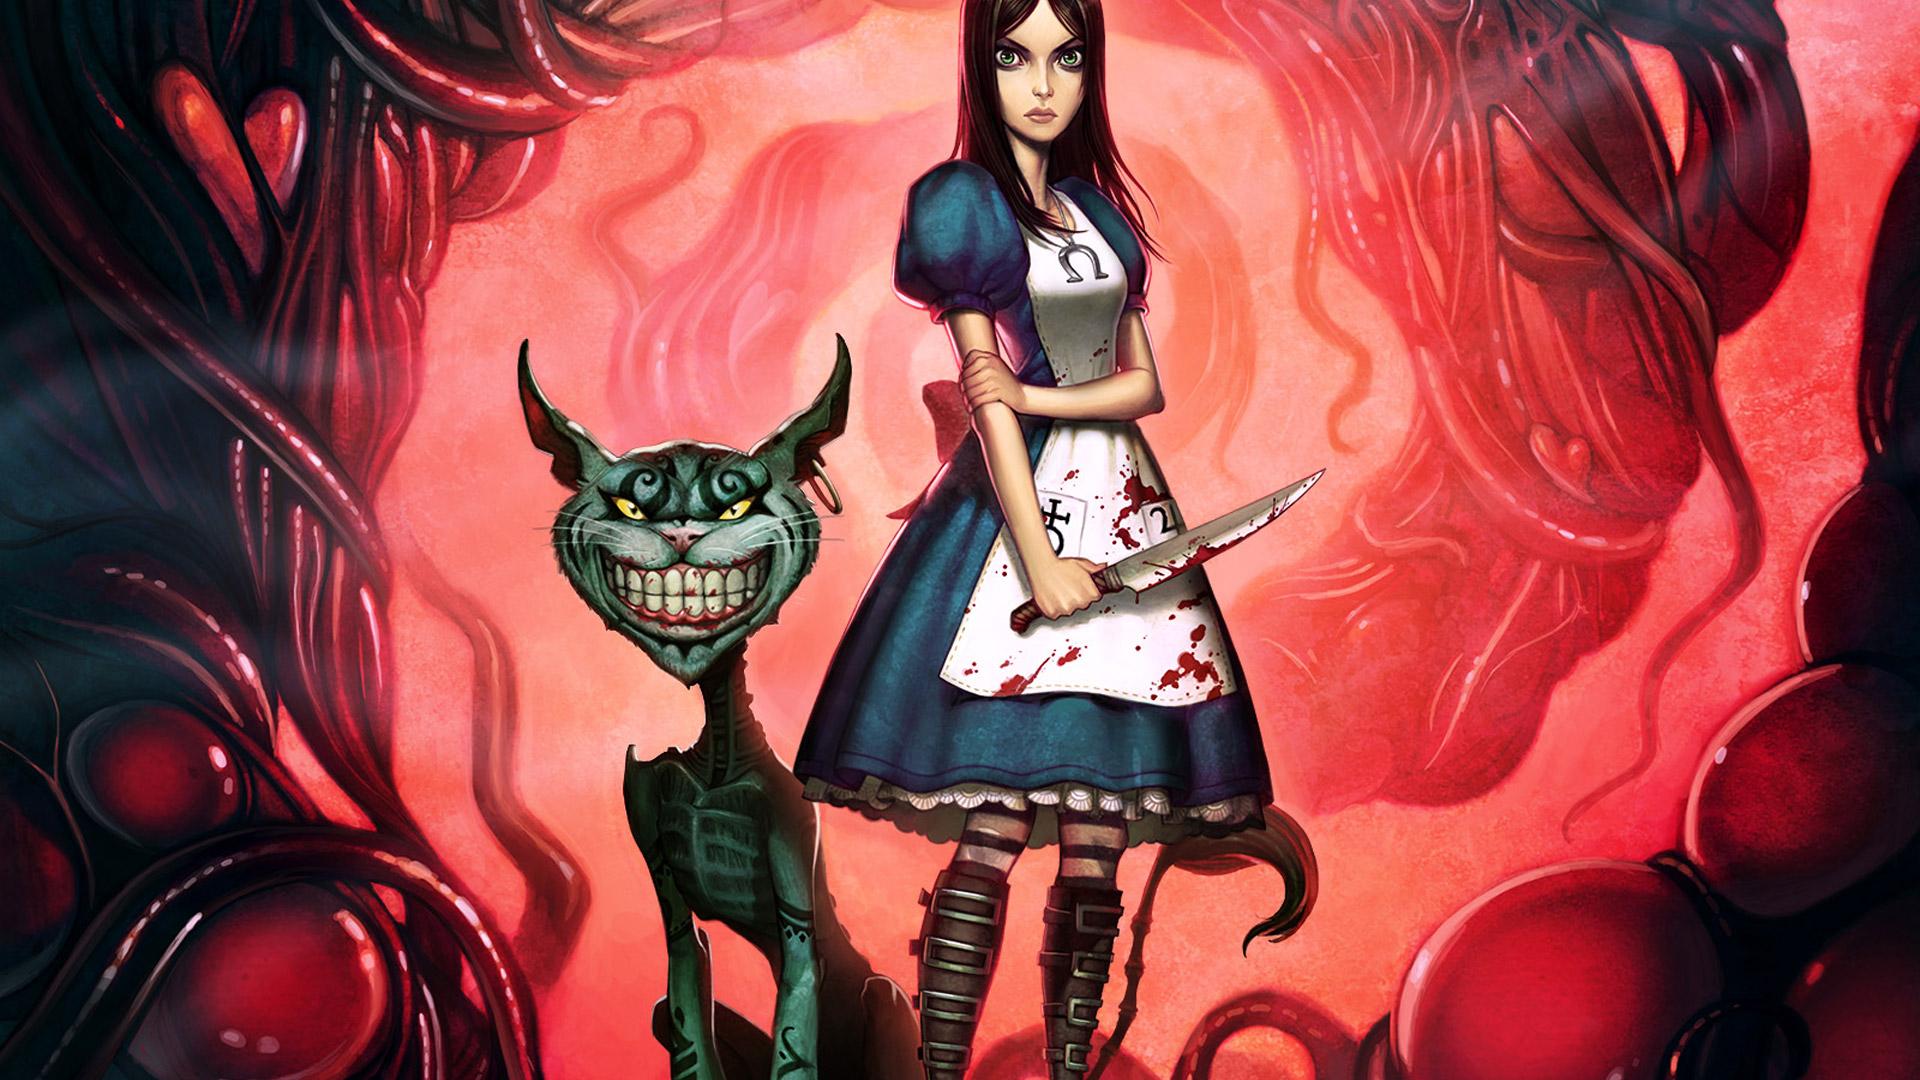 Alice: Madness Returns Wallpaper in 1920x1080